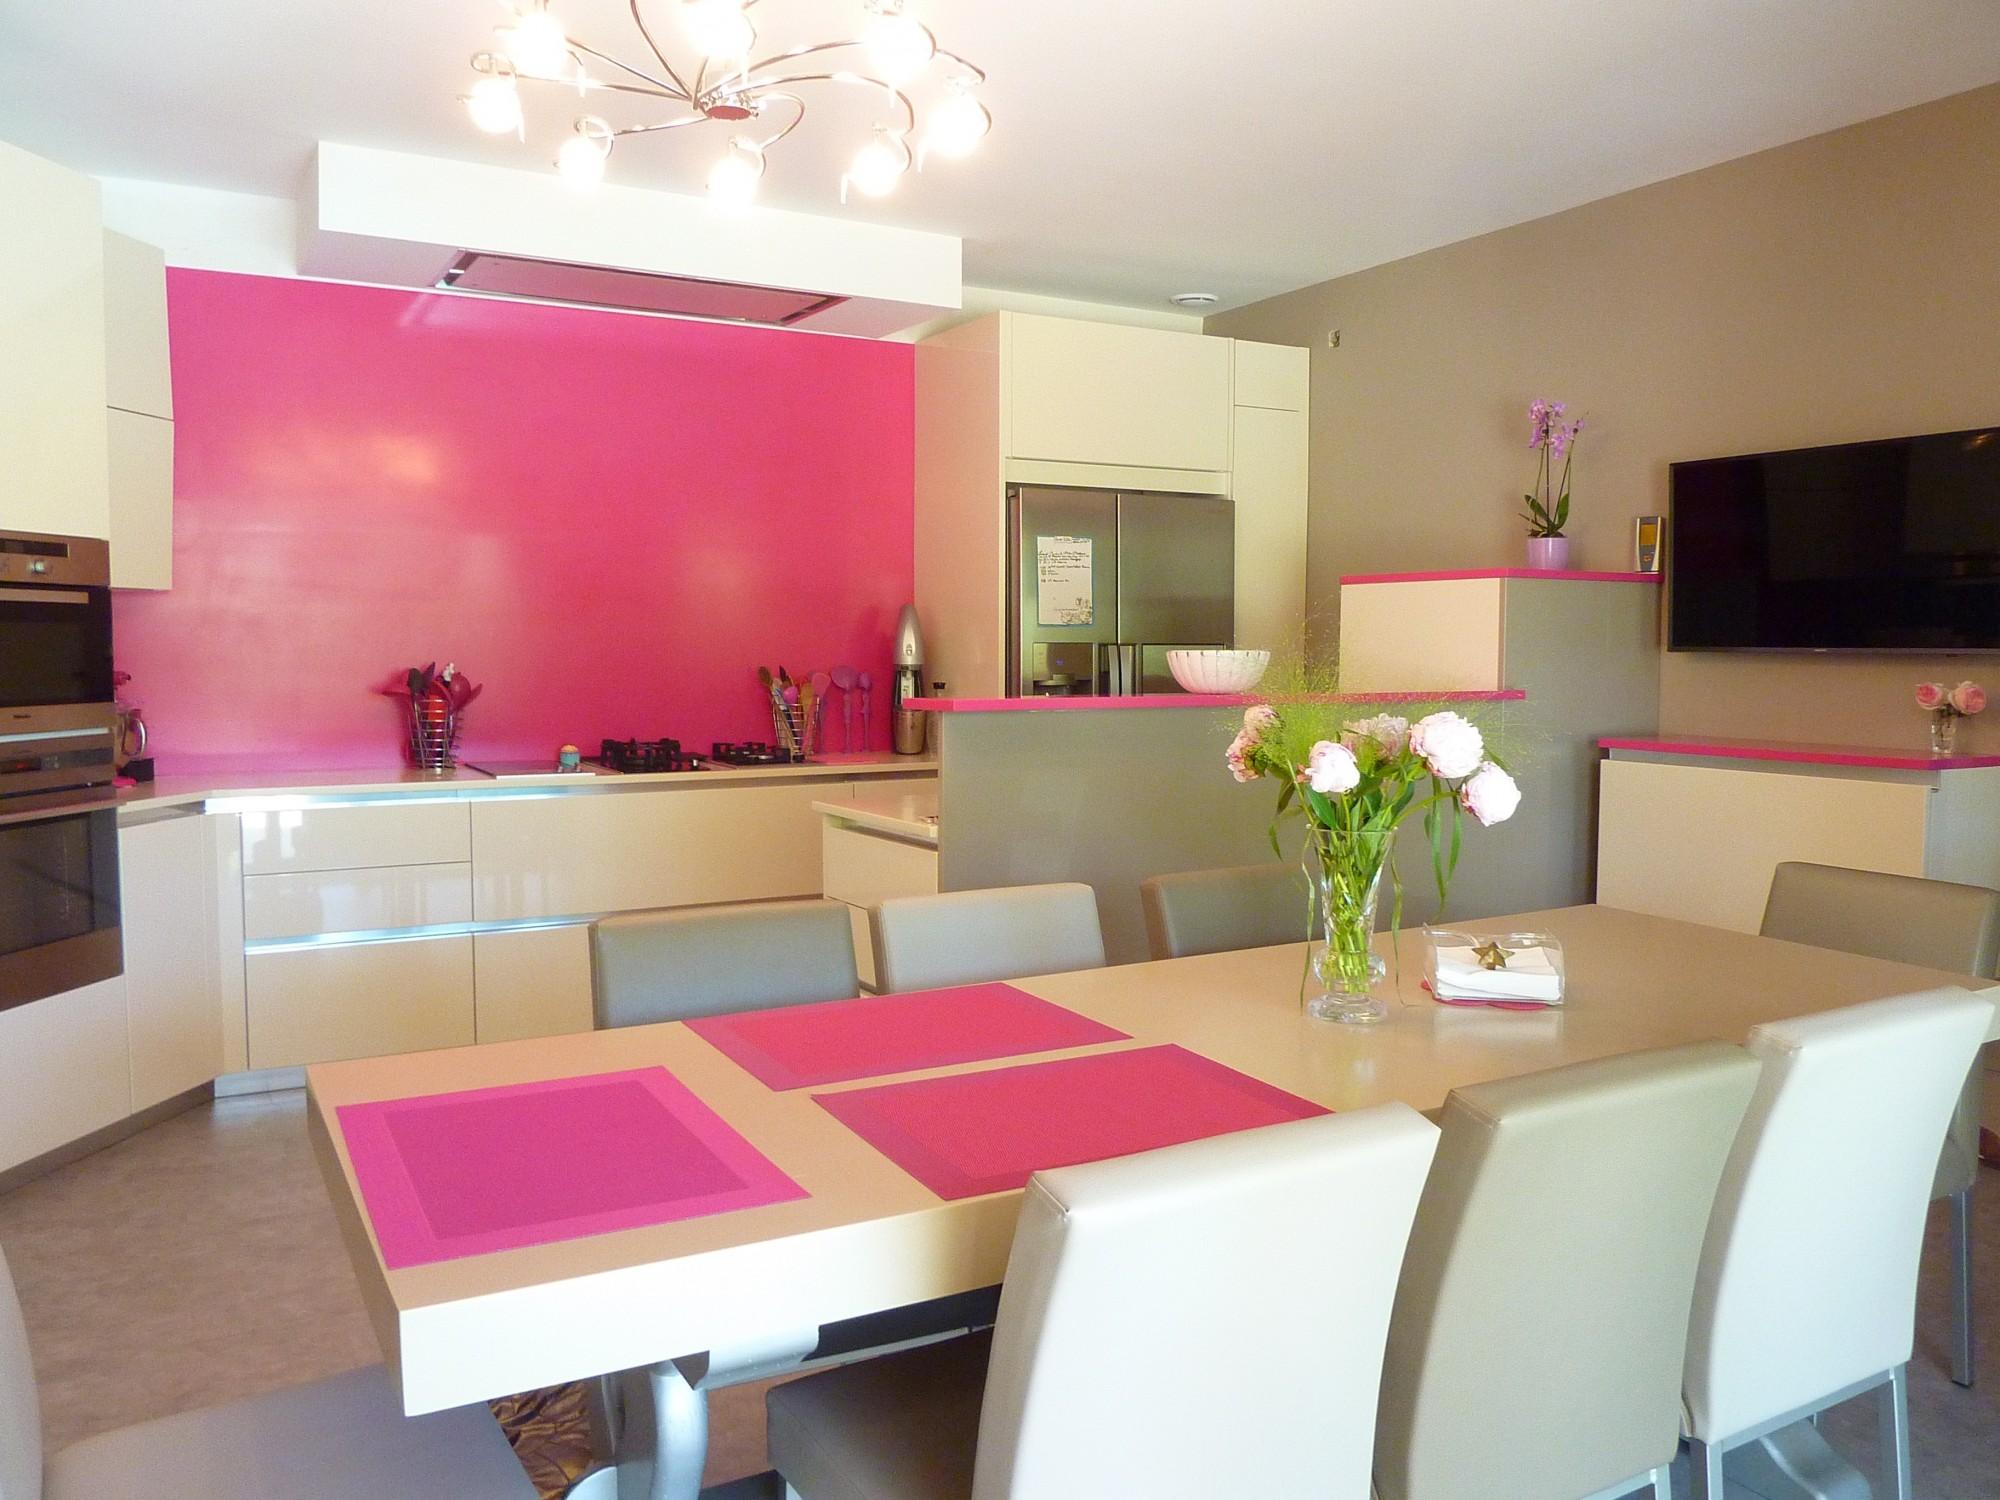 arcachon pereire magnifique villa contemporaine avec piscine barnes bassin d 39 arcachon. Black Bedroom Furniture Sets. Home Design Ideas